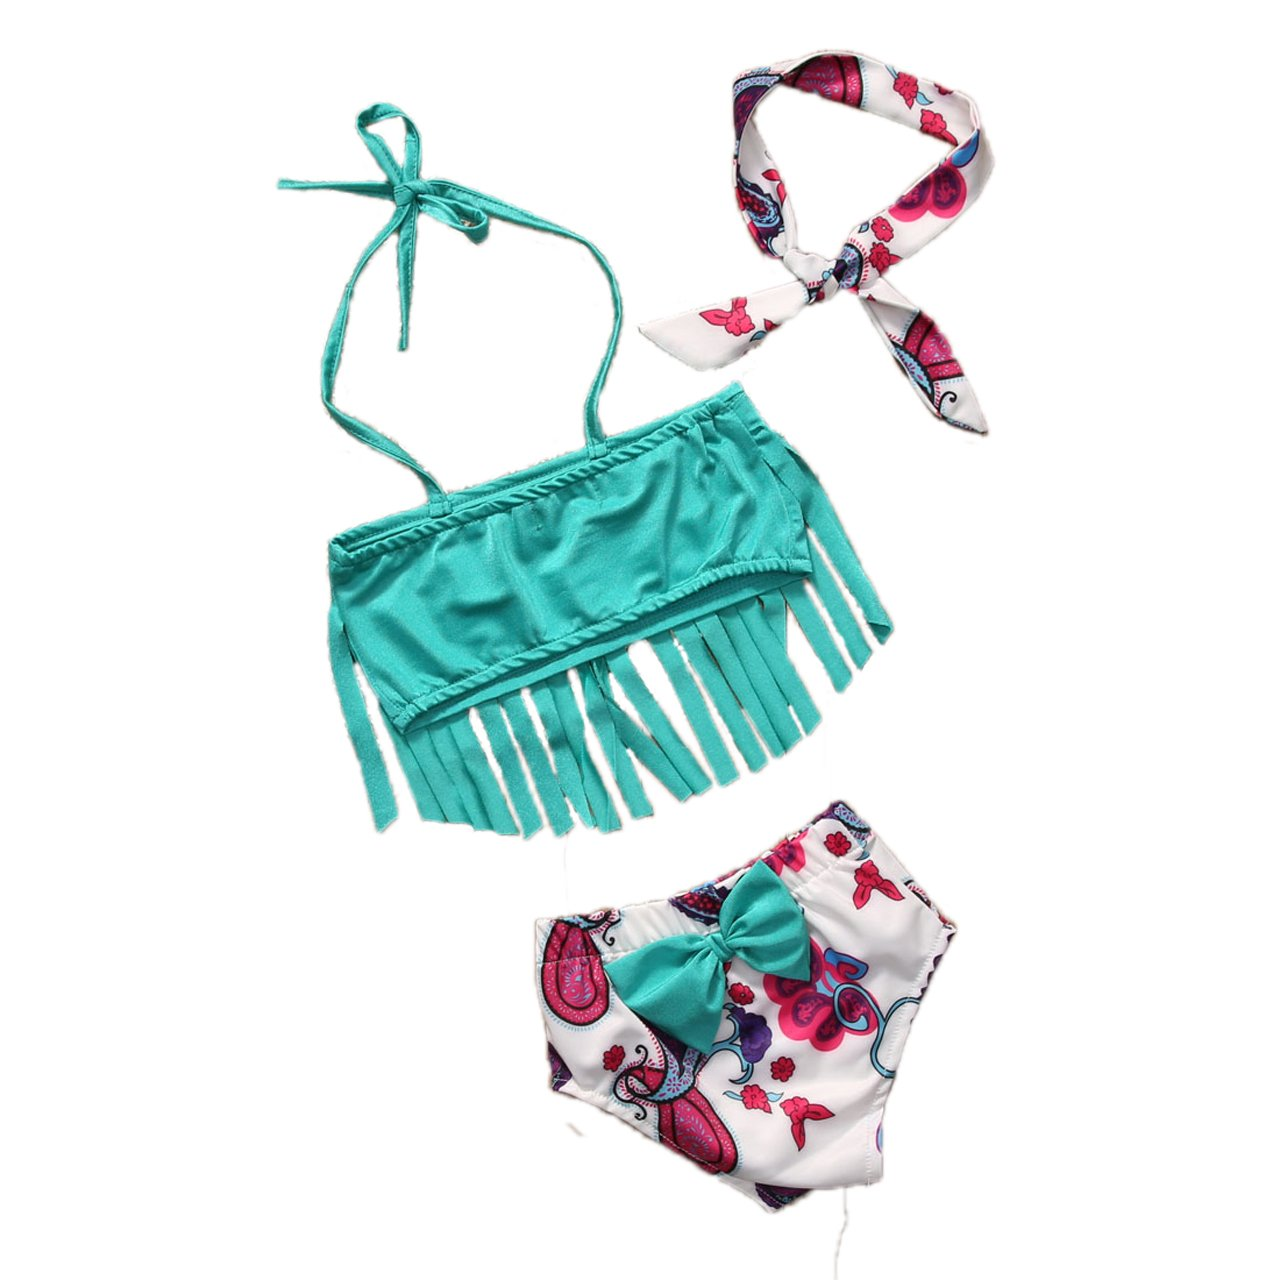 hirigin Baby Girls 3 Pcs Swimwear Tassels Halter Top+Floral Bottom+Headband Swimsuit